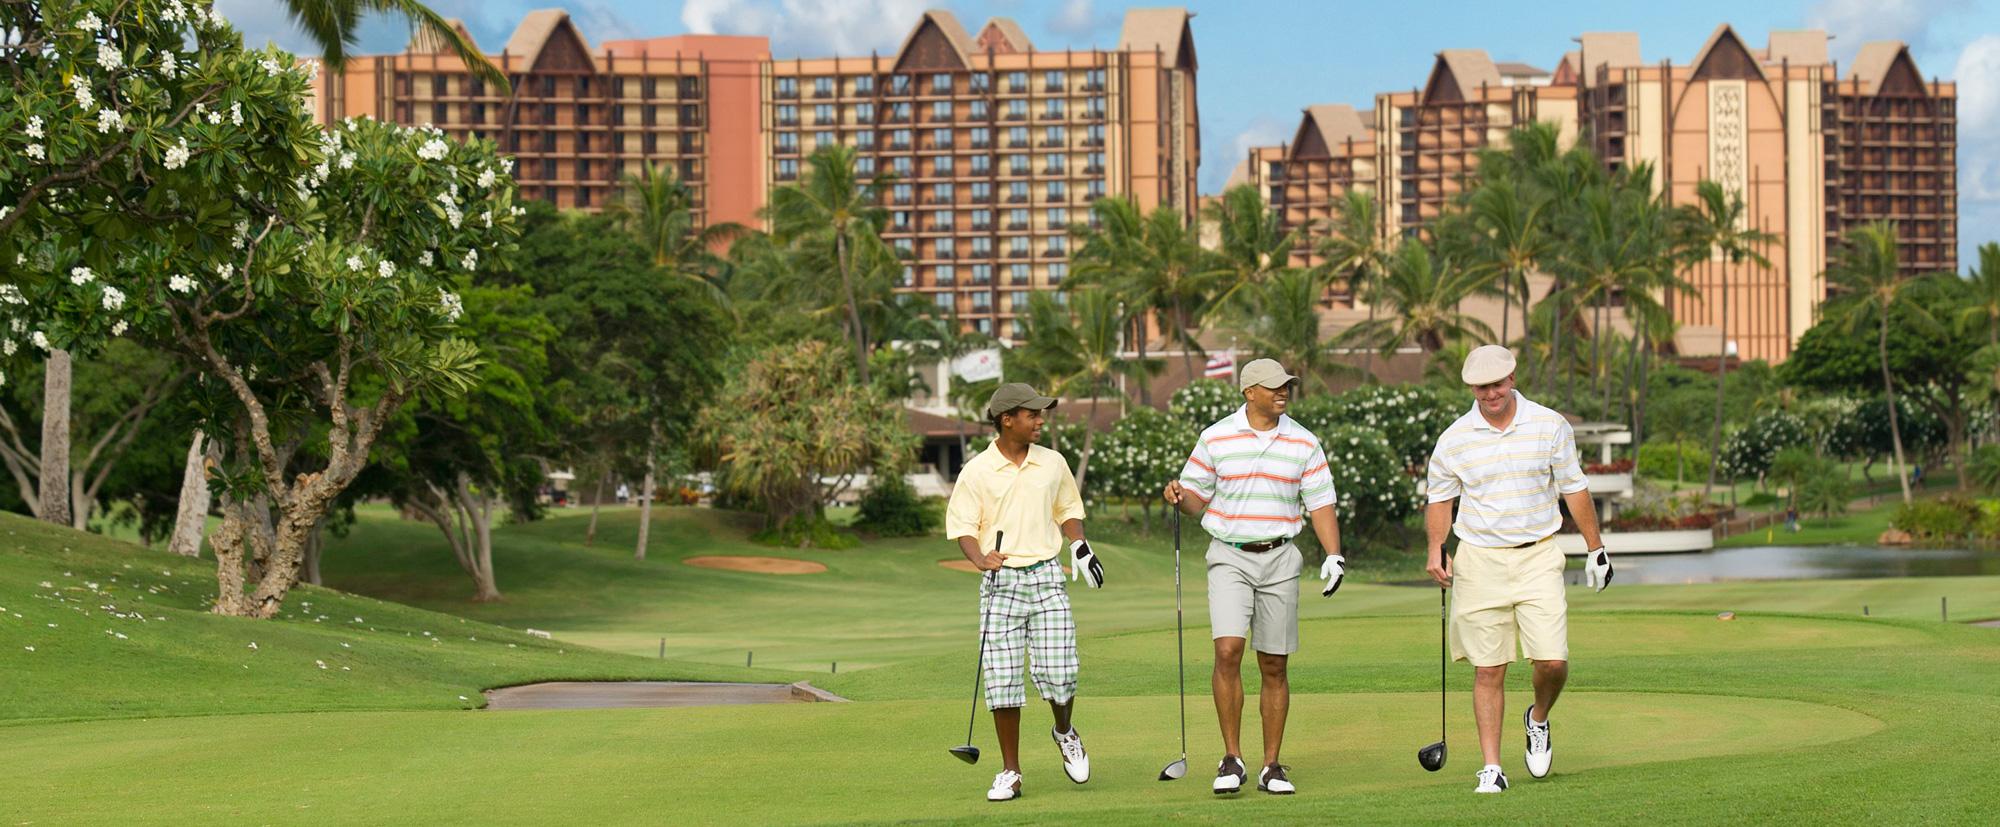 Three men in golf attire walk across the green, each carrying a golf club